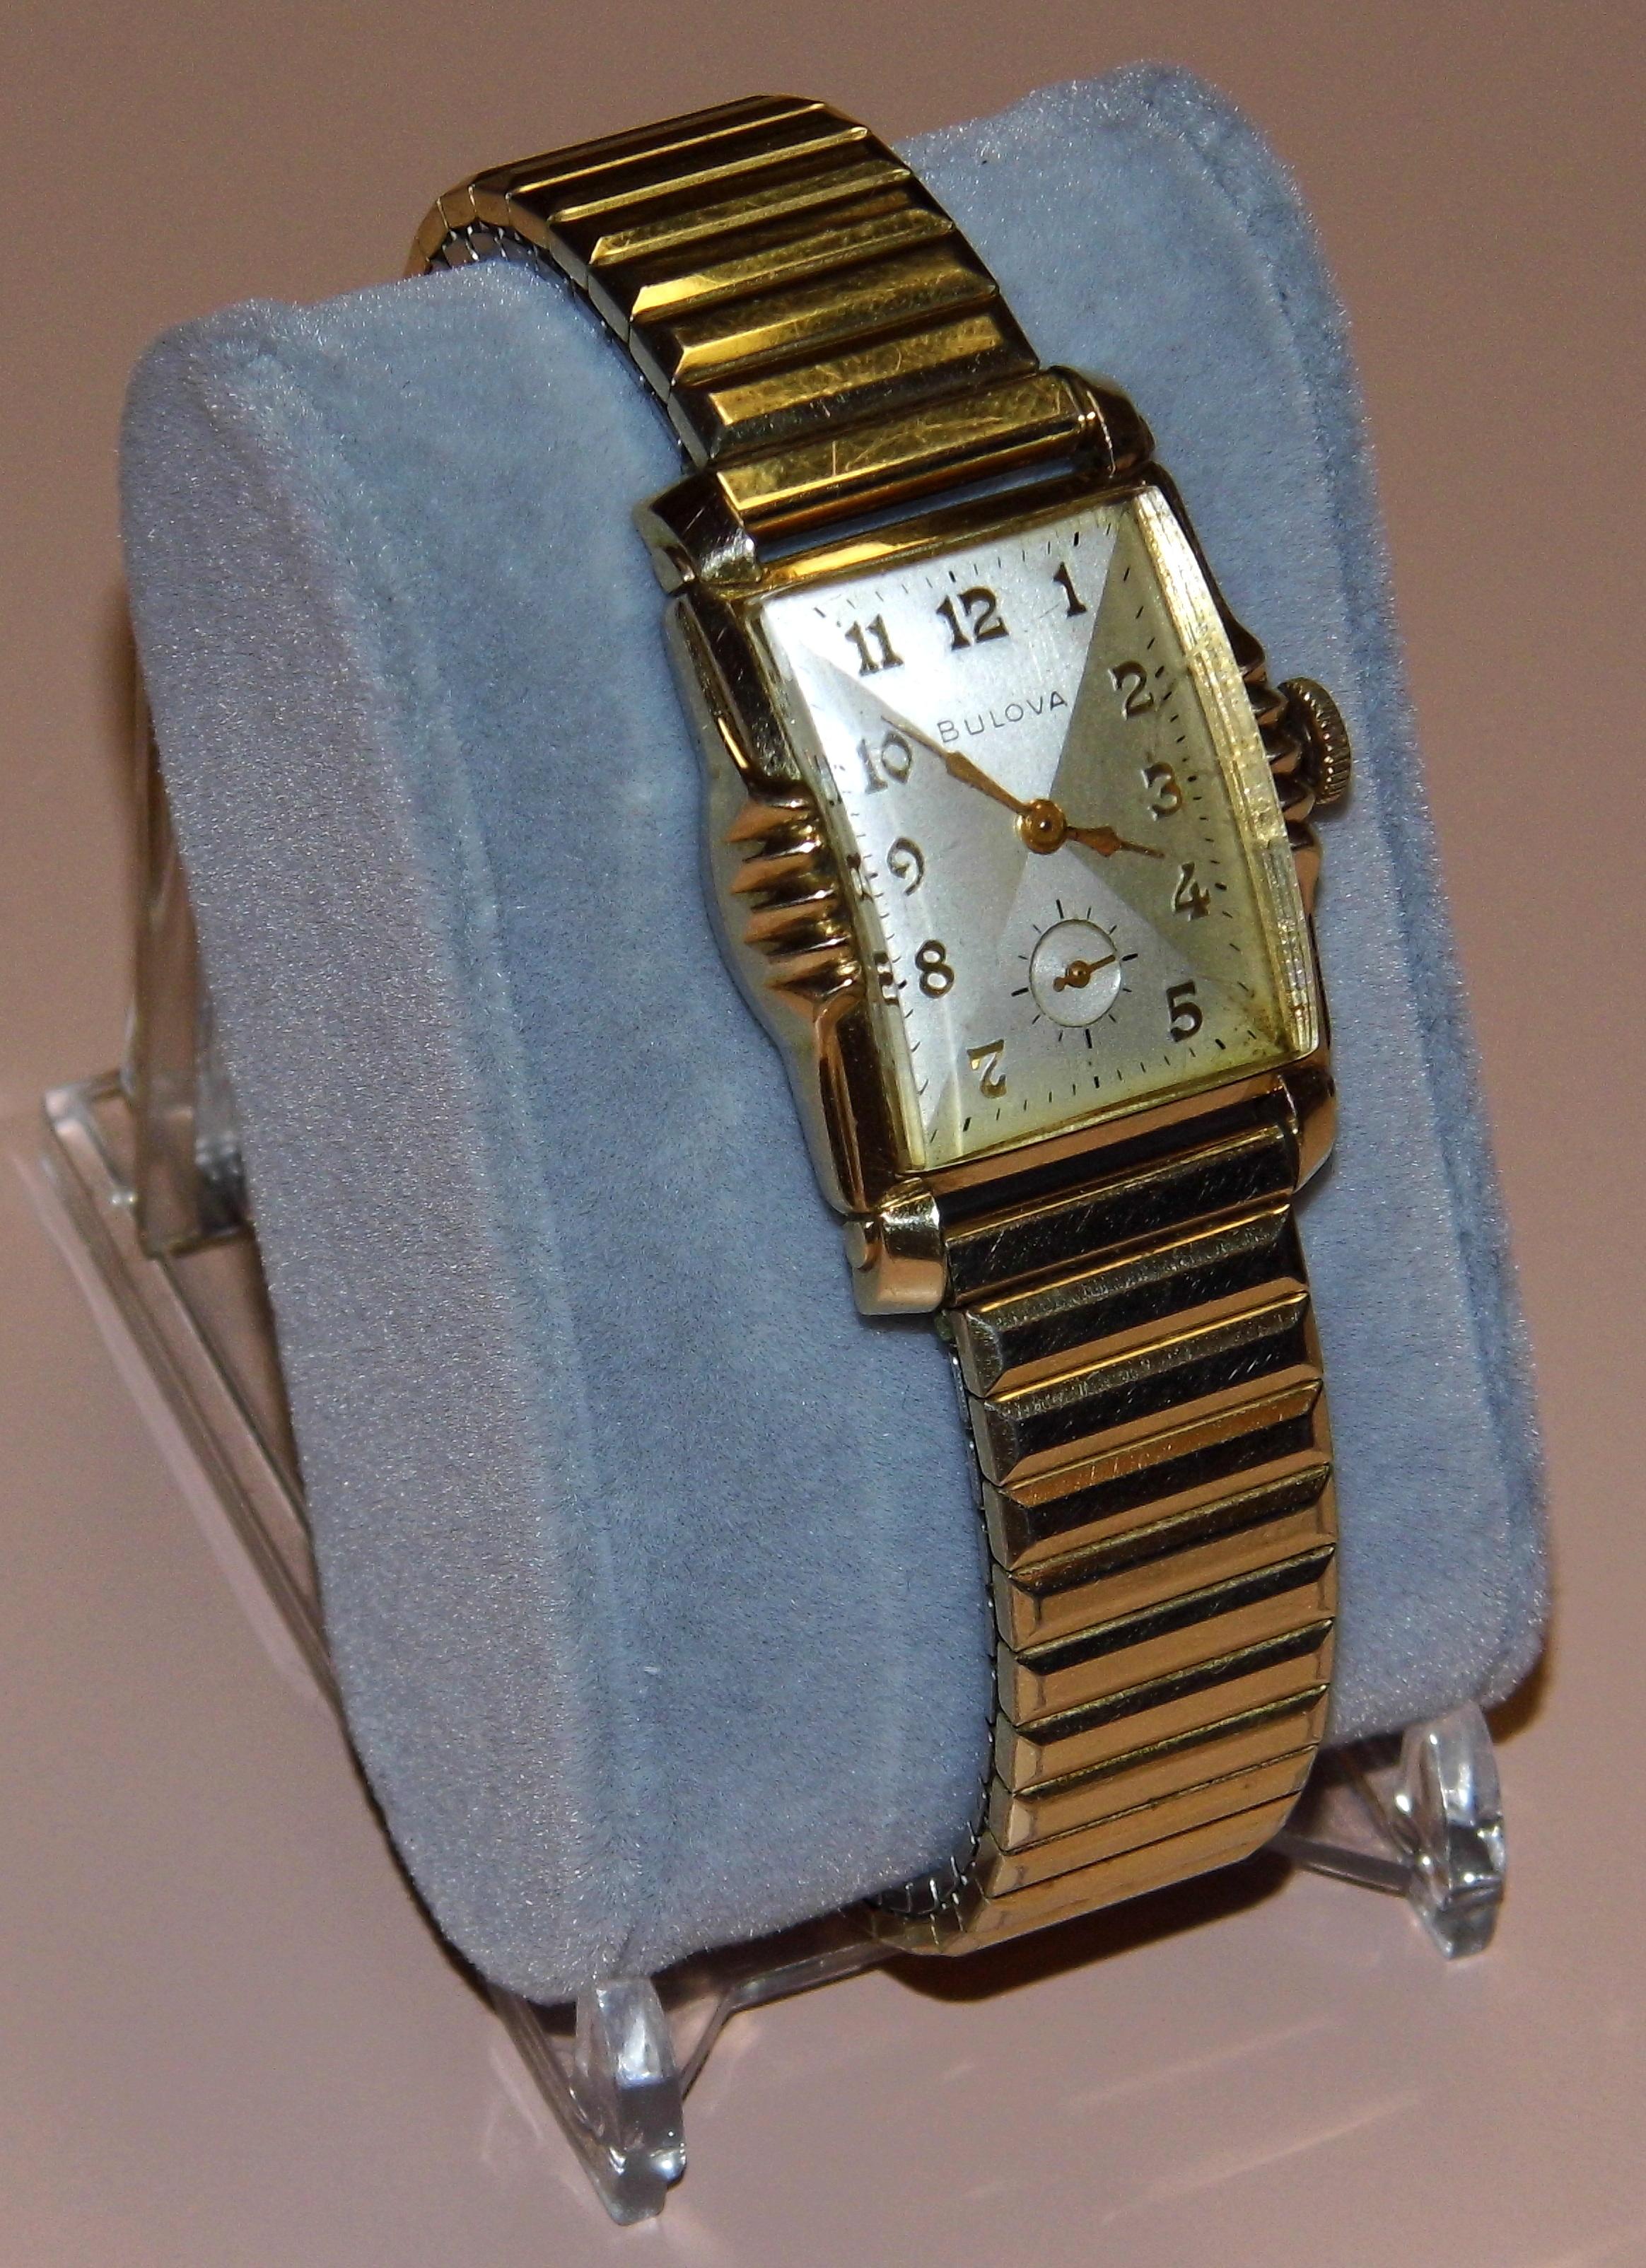 Antique Bulova Wrist Watches